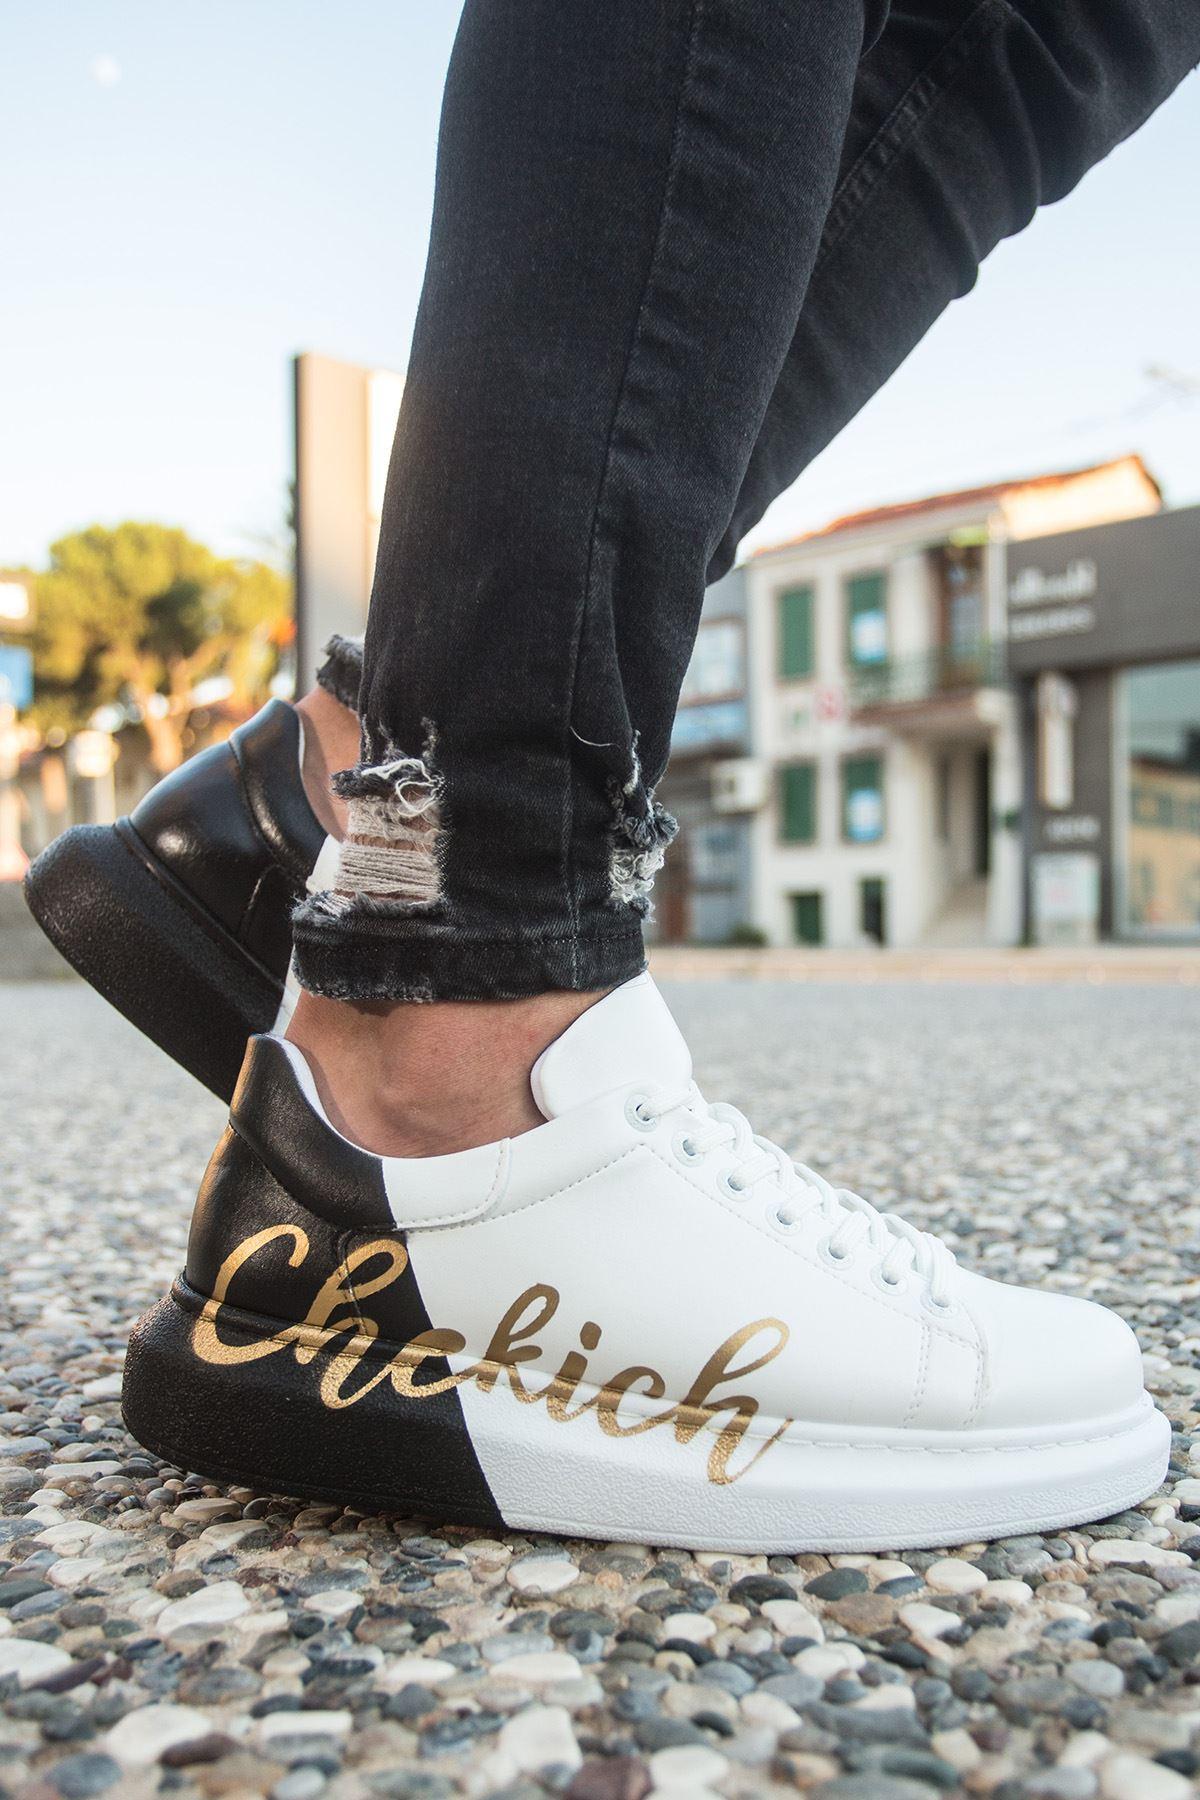 Chekich CH254 BT Erkek Ayakkabı 426 BEYAZ-SİYAH CHEKICH